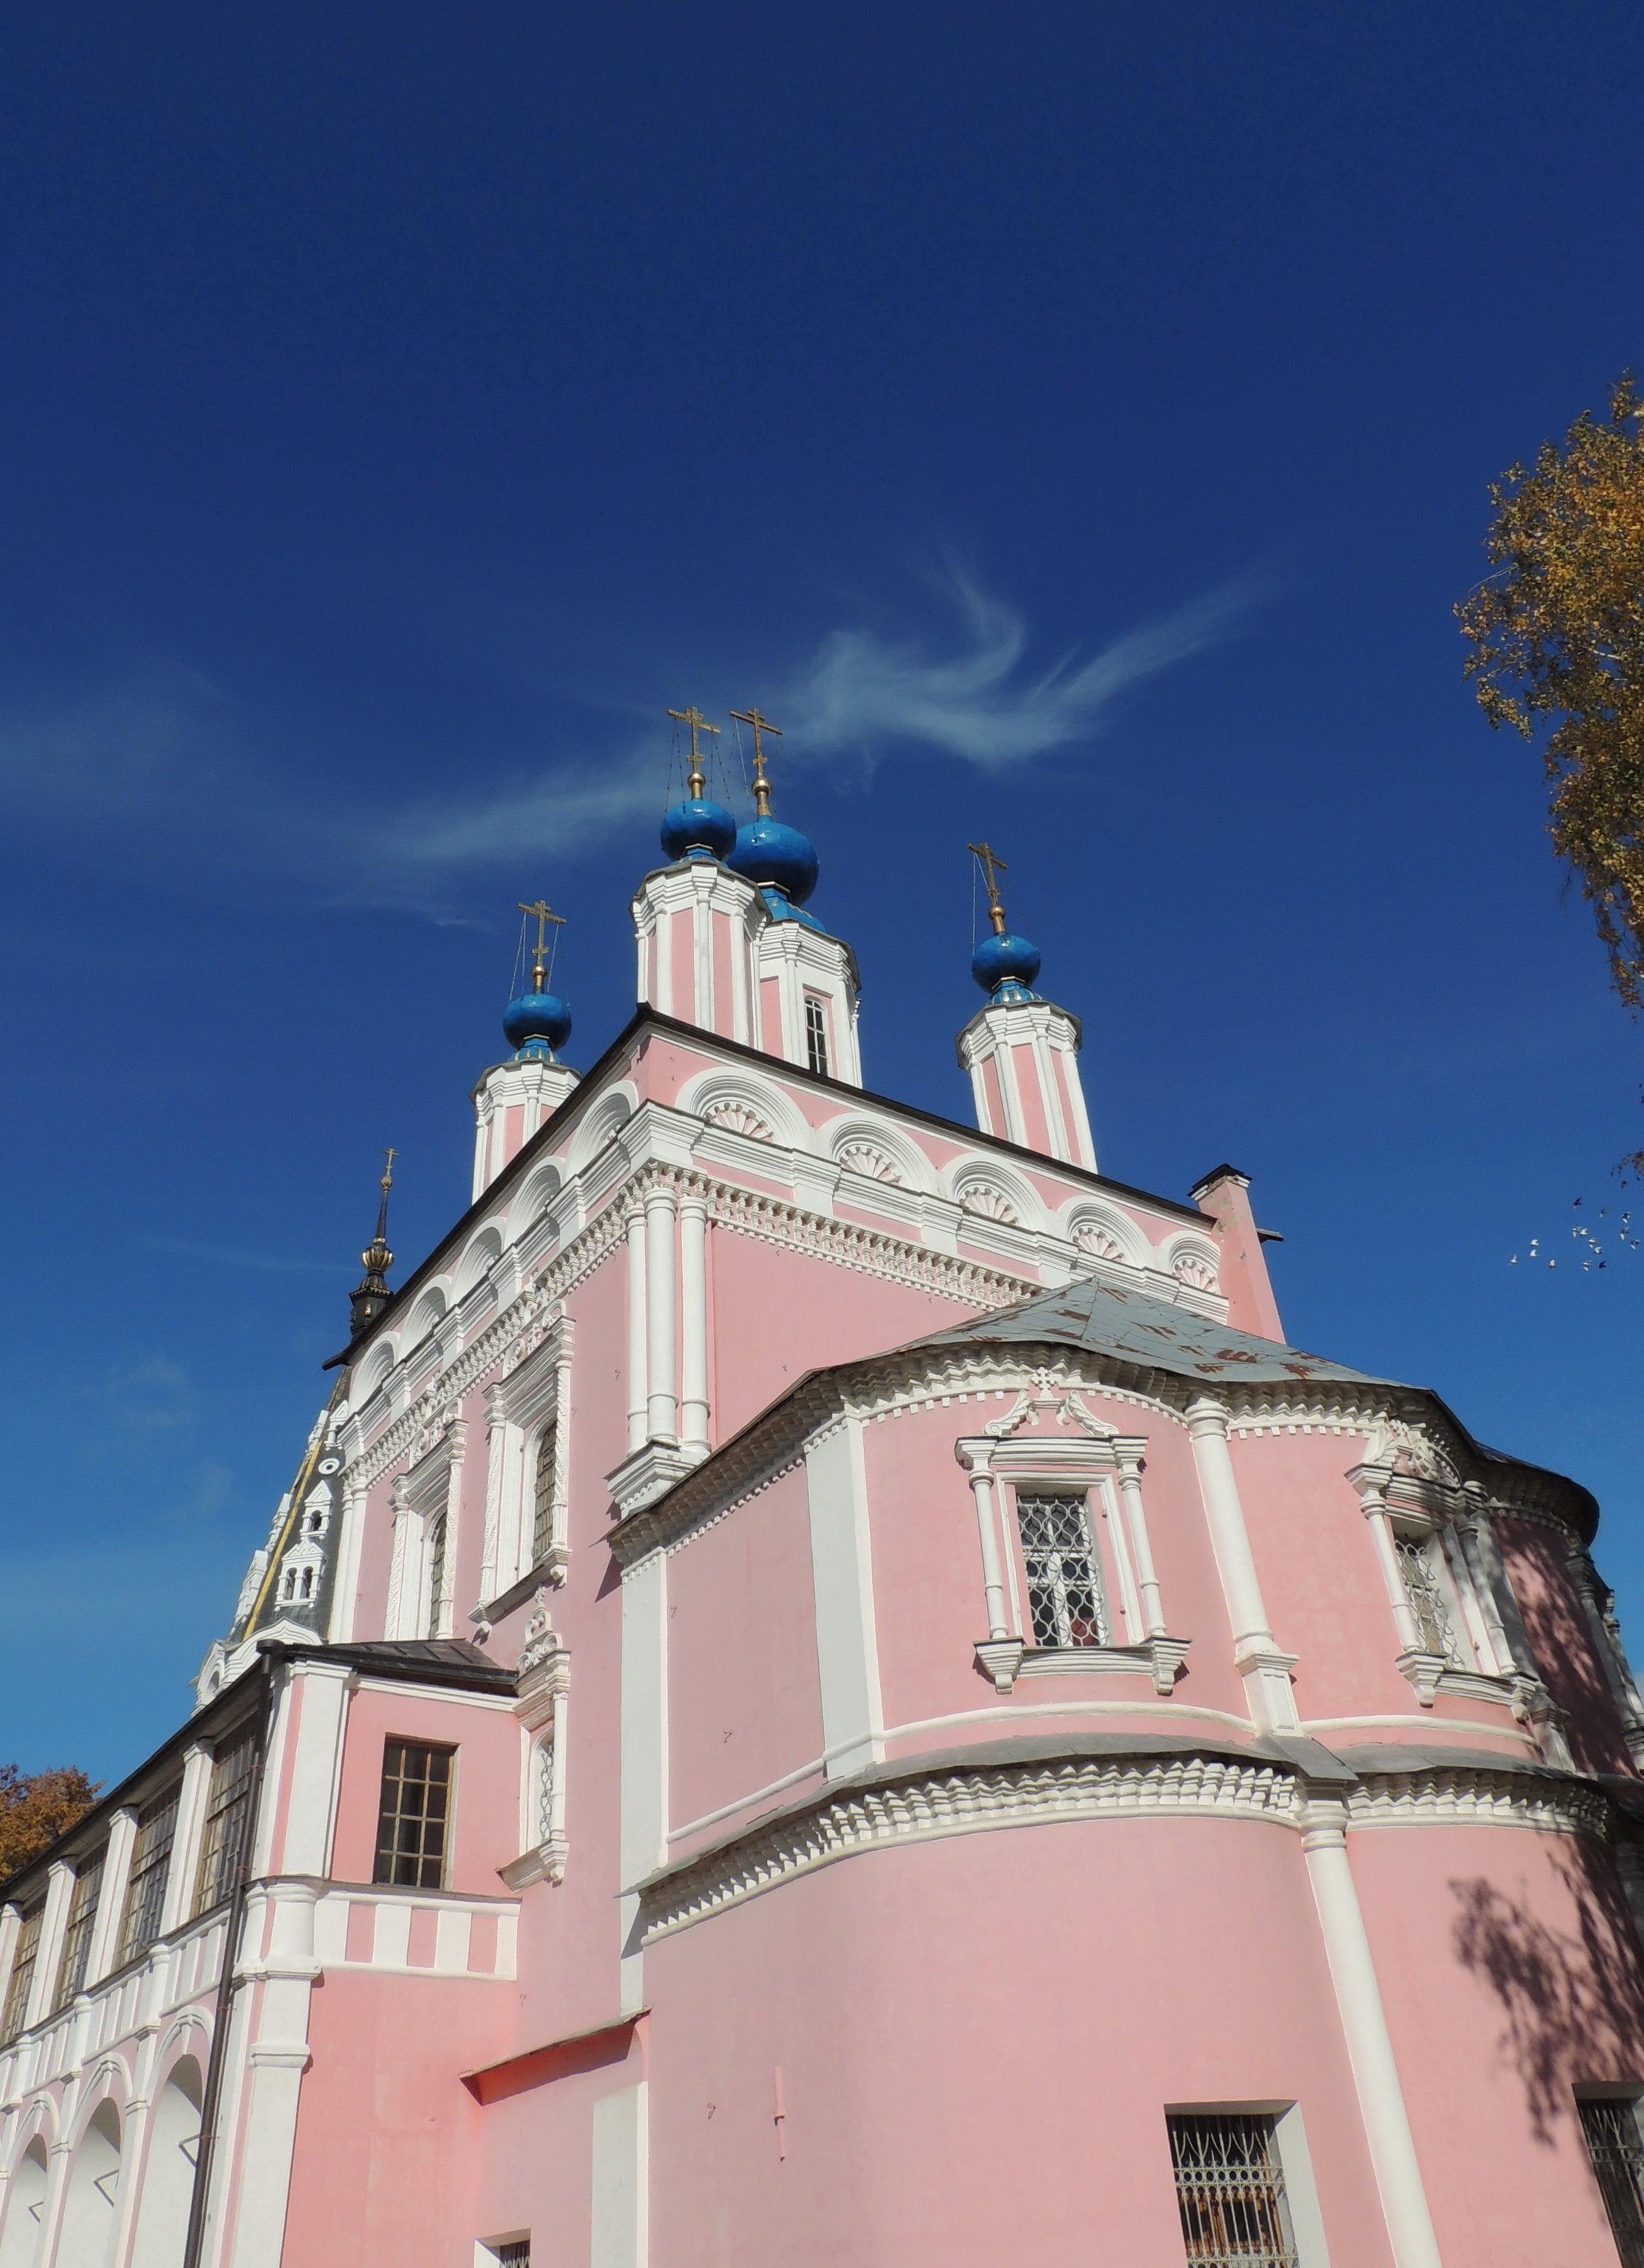 http://monuspen.ru/photoreports/7df66090564ac3621568a9866ab706af.JPG